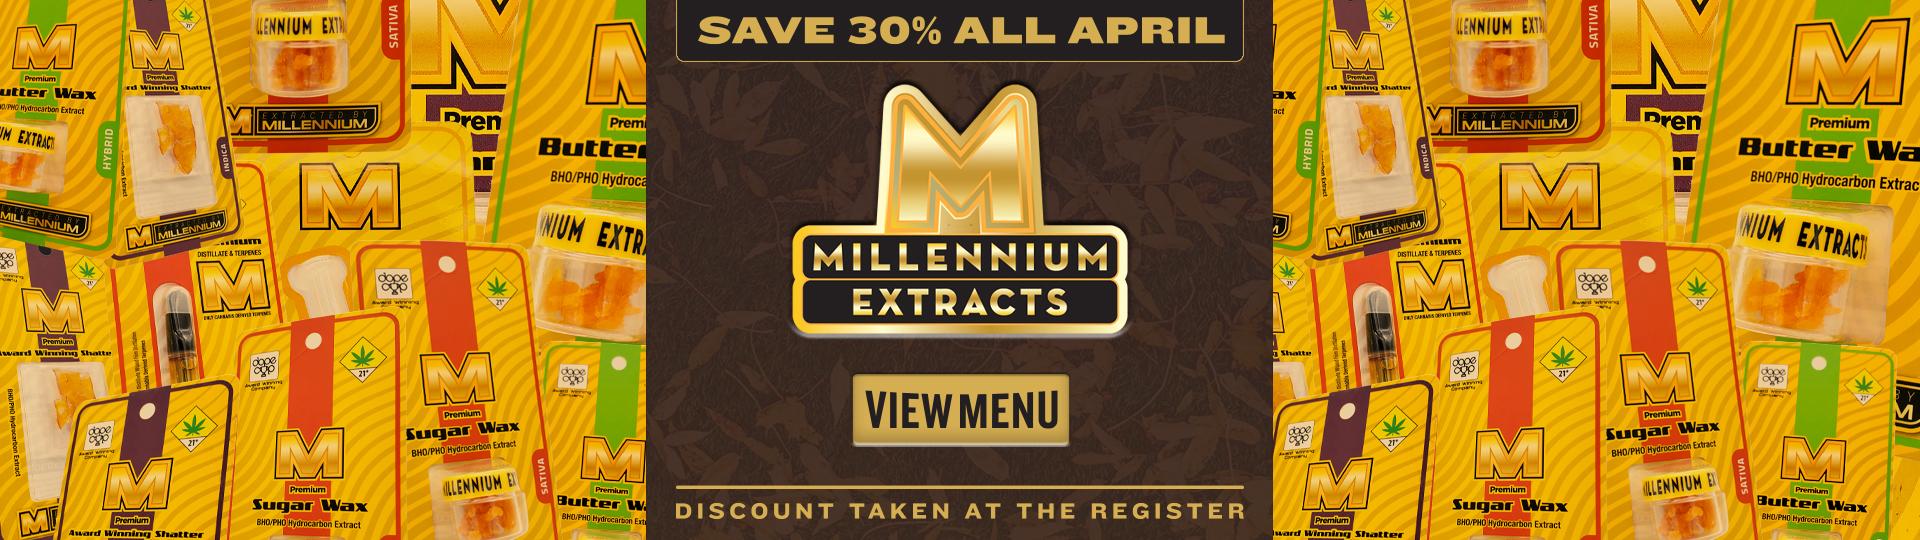 Millennium extracts